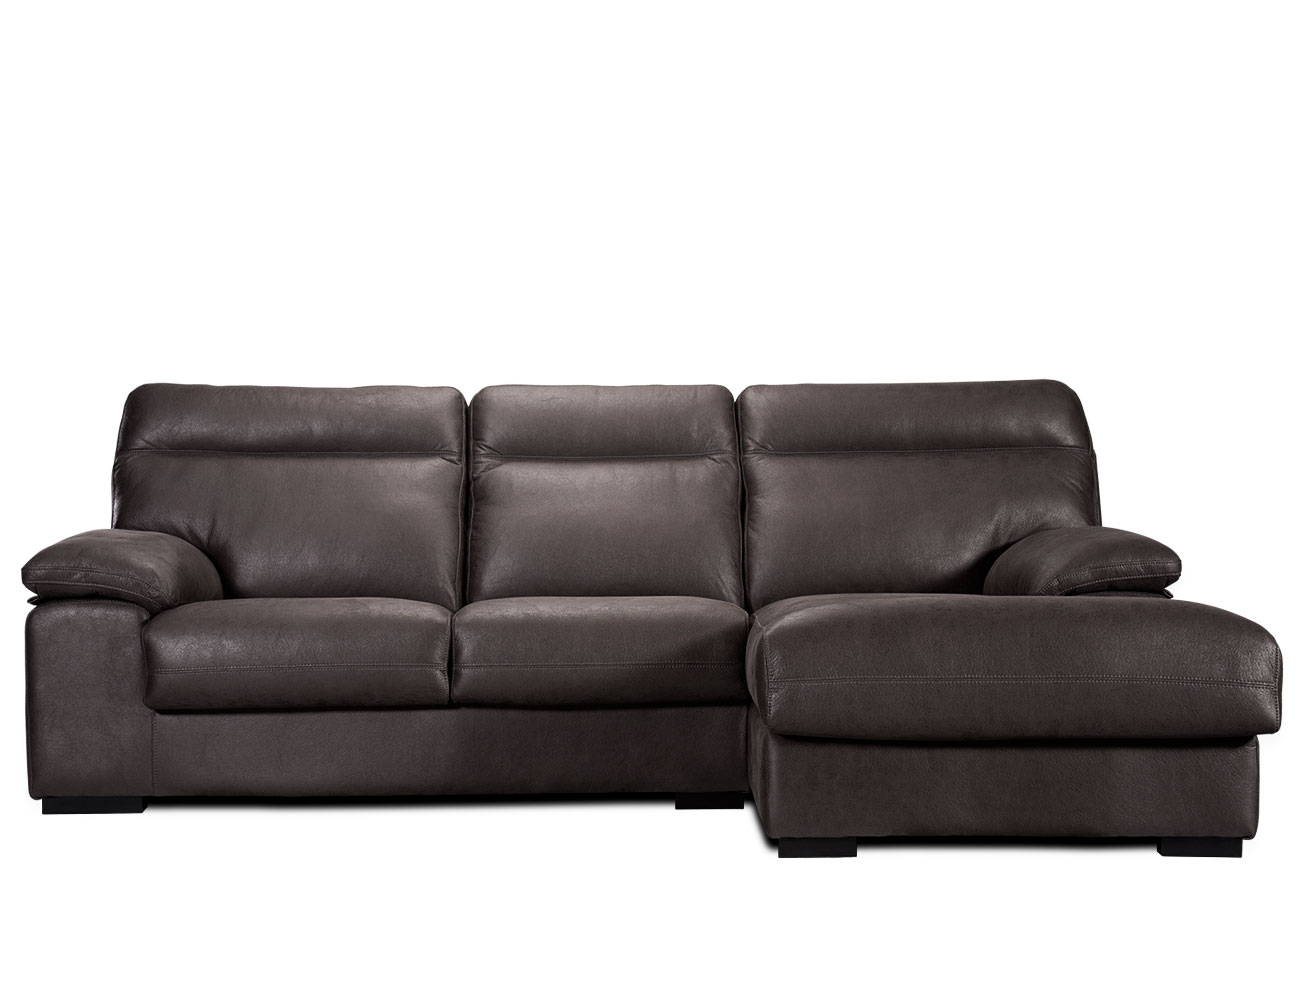 Sofa chaiselongue gran confort tejido antimanchas 2